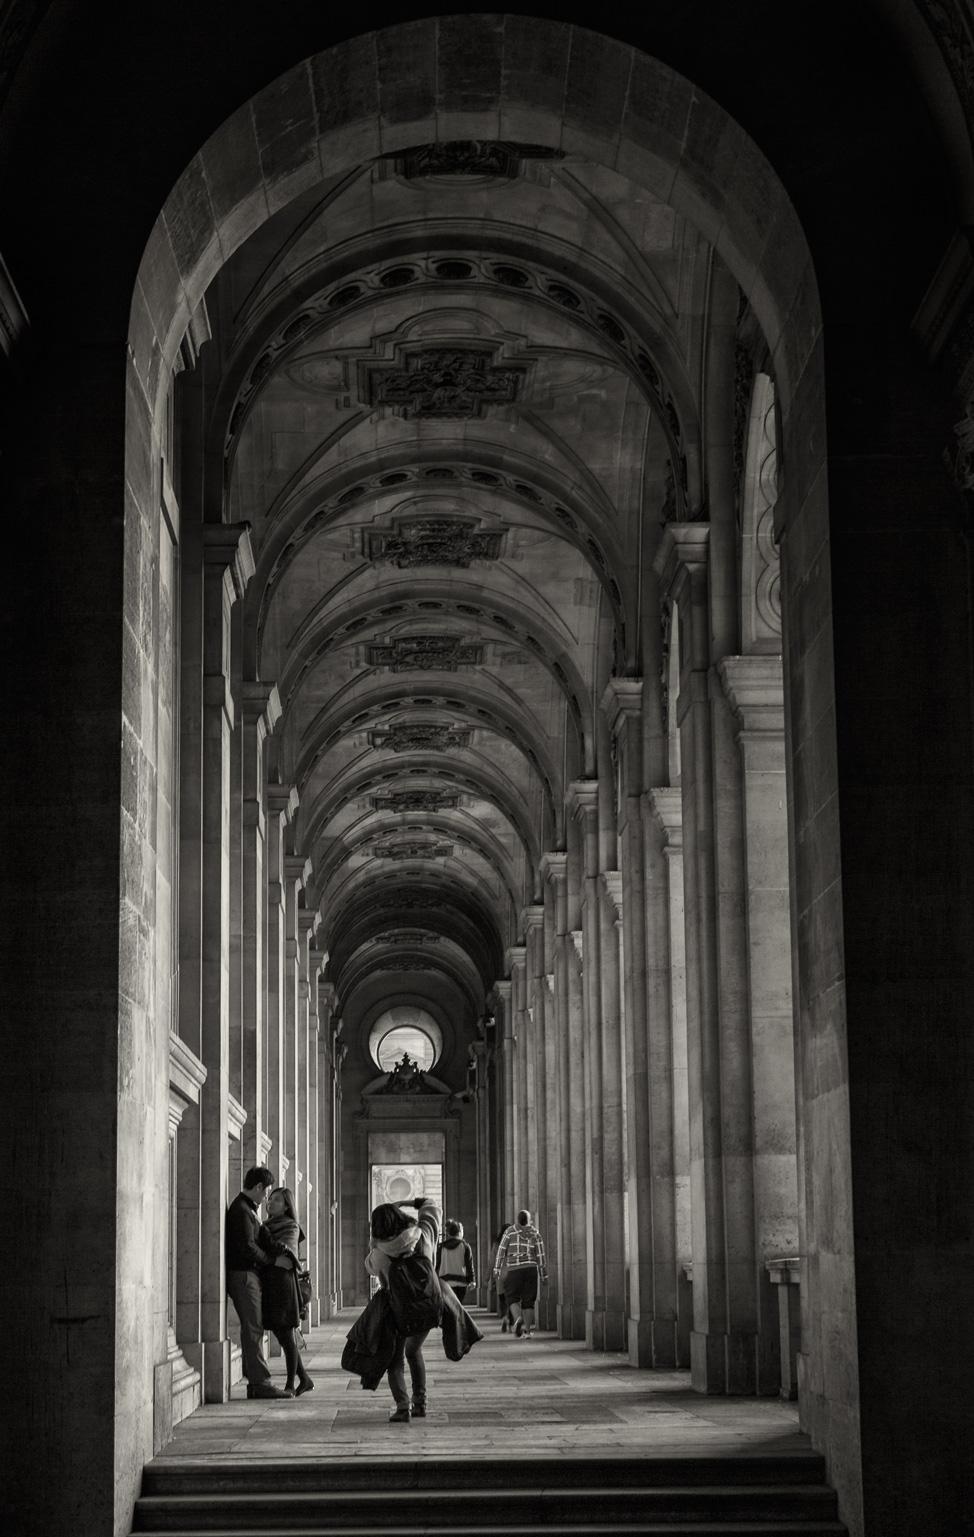 Louvre Corridors